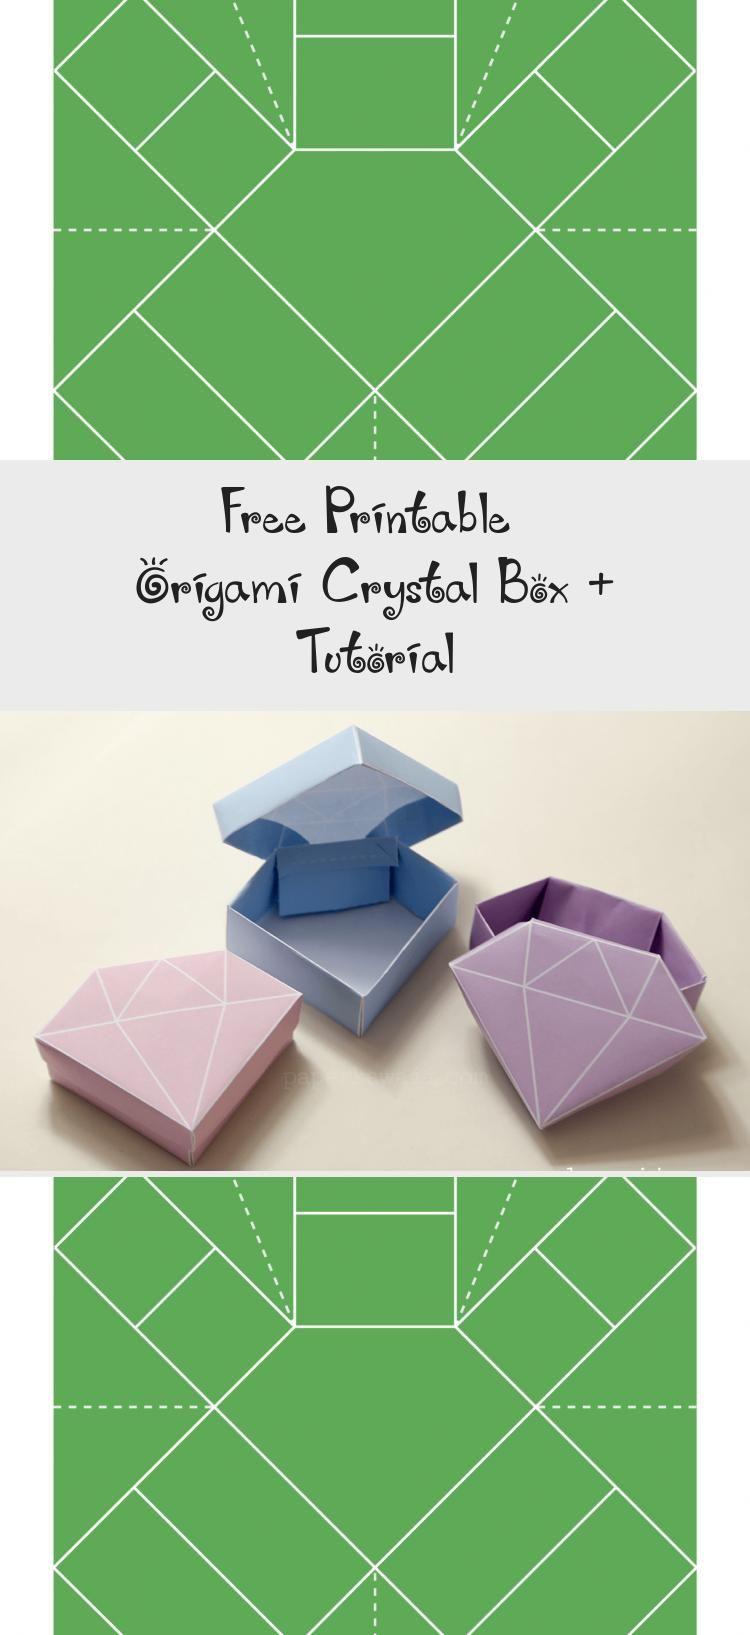 Photo of origami-gem-box-template-corral-lid #origamiTurtle #origamiCat #origamiFacile #o…